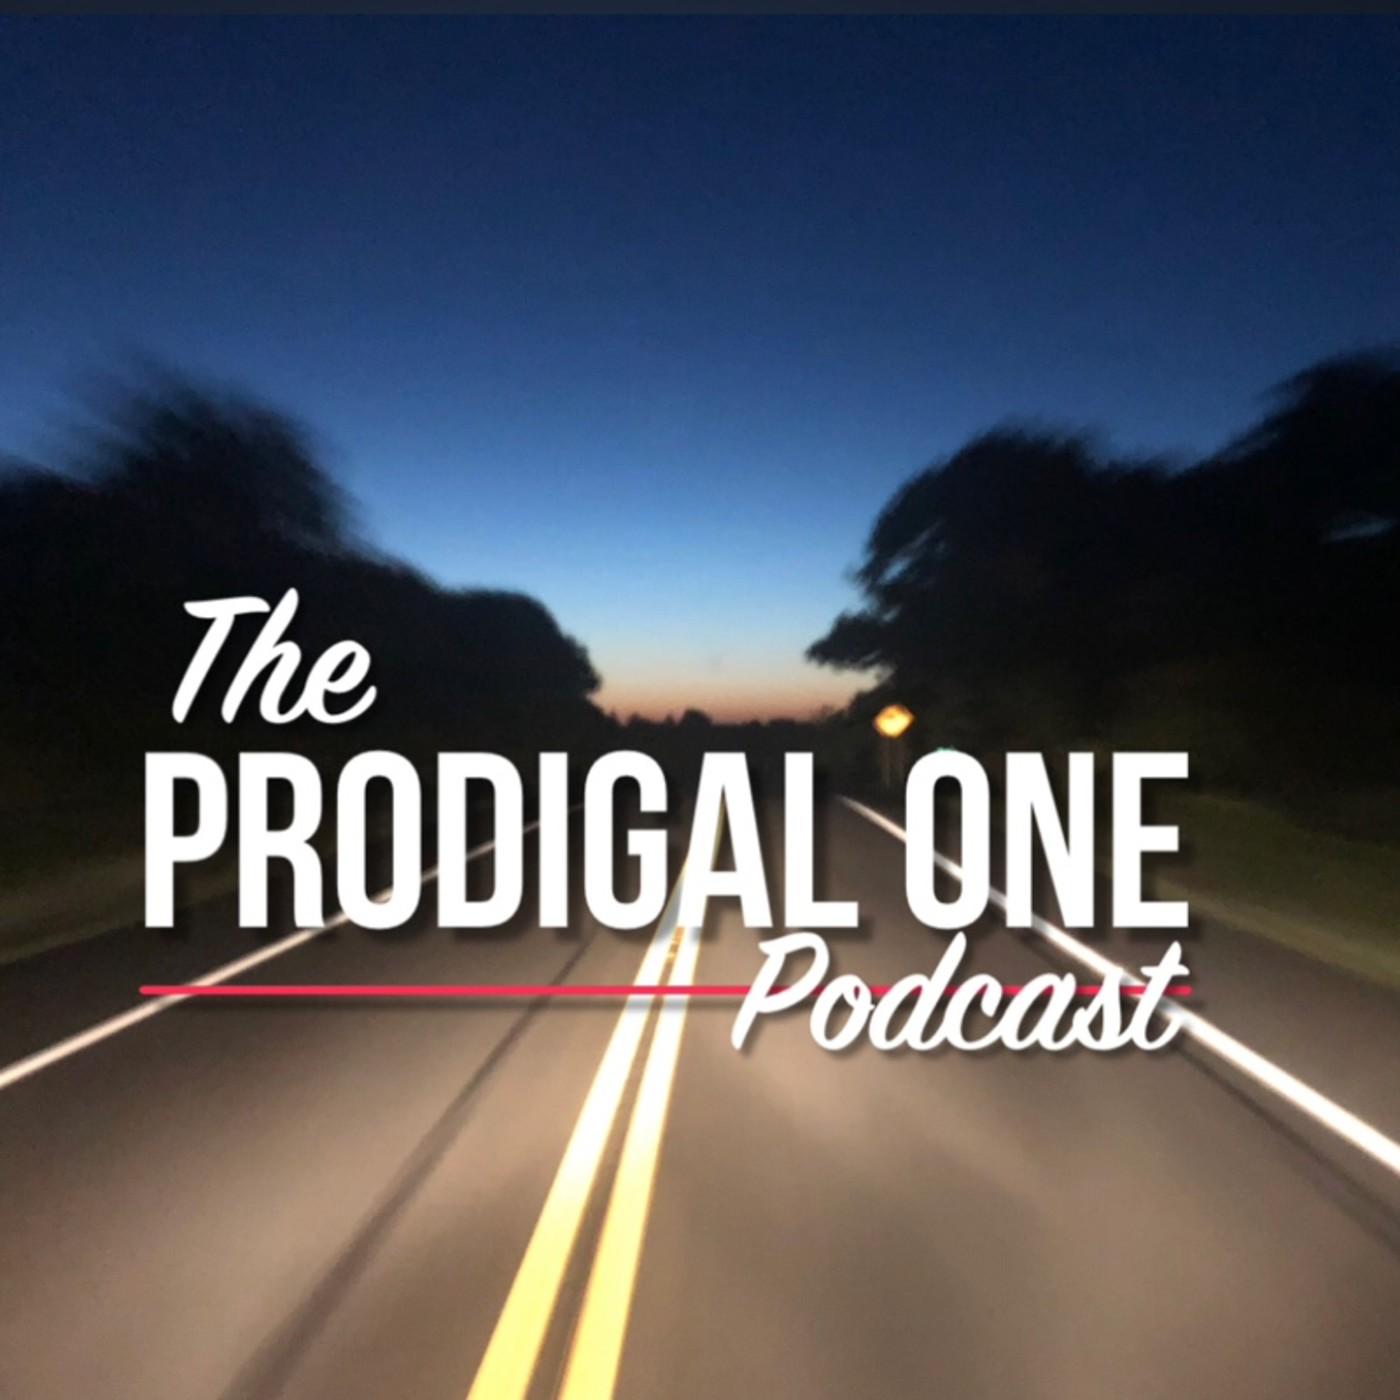 The Prodigal One Radio Show